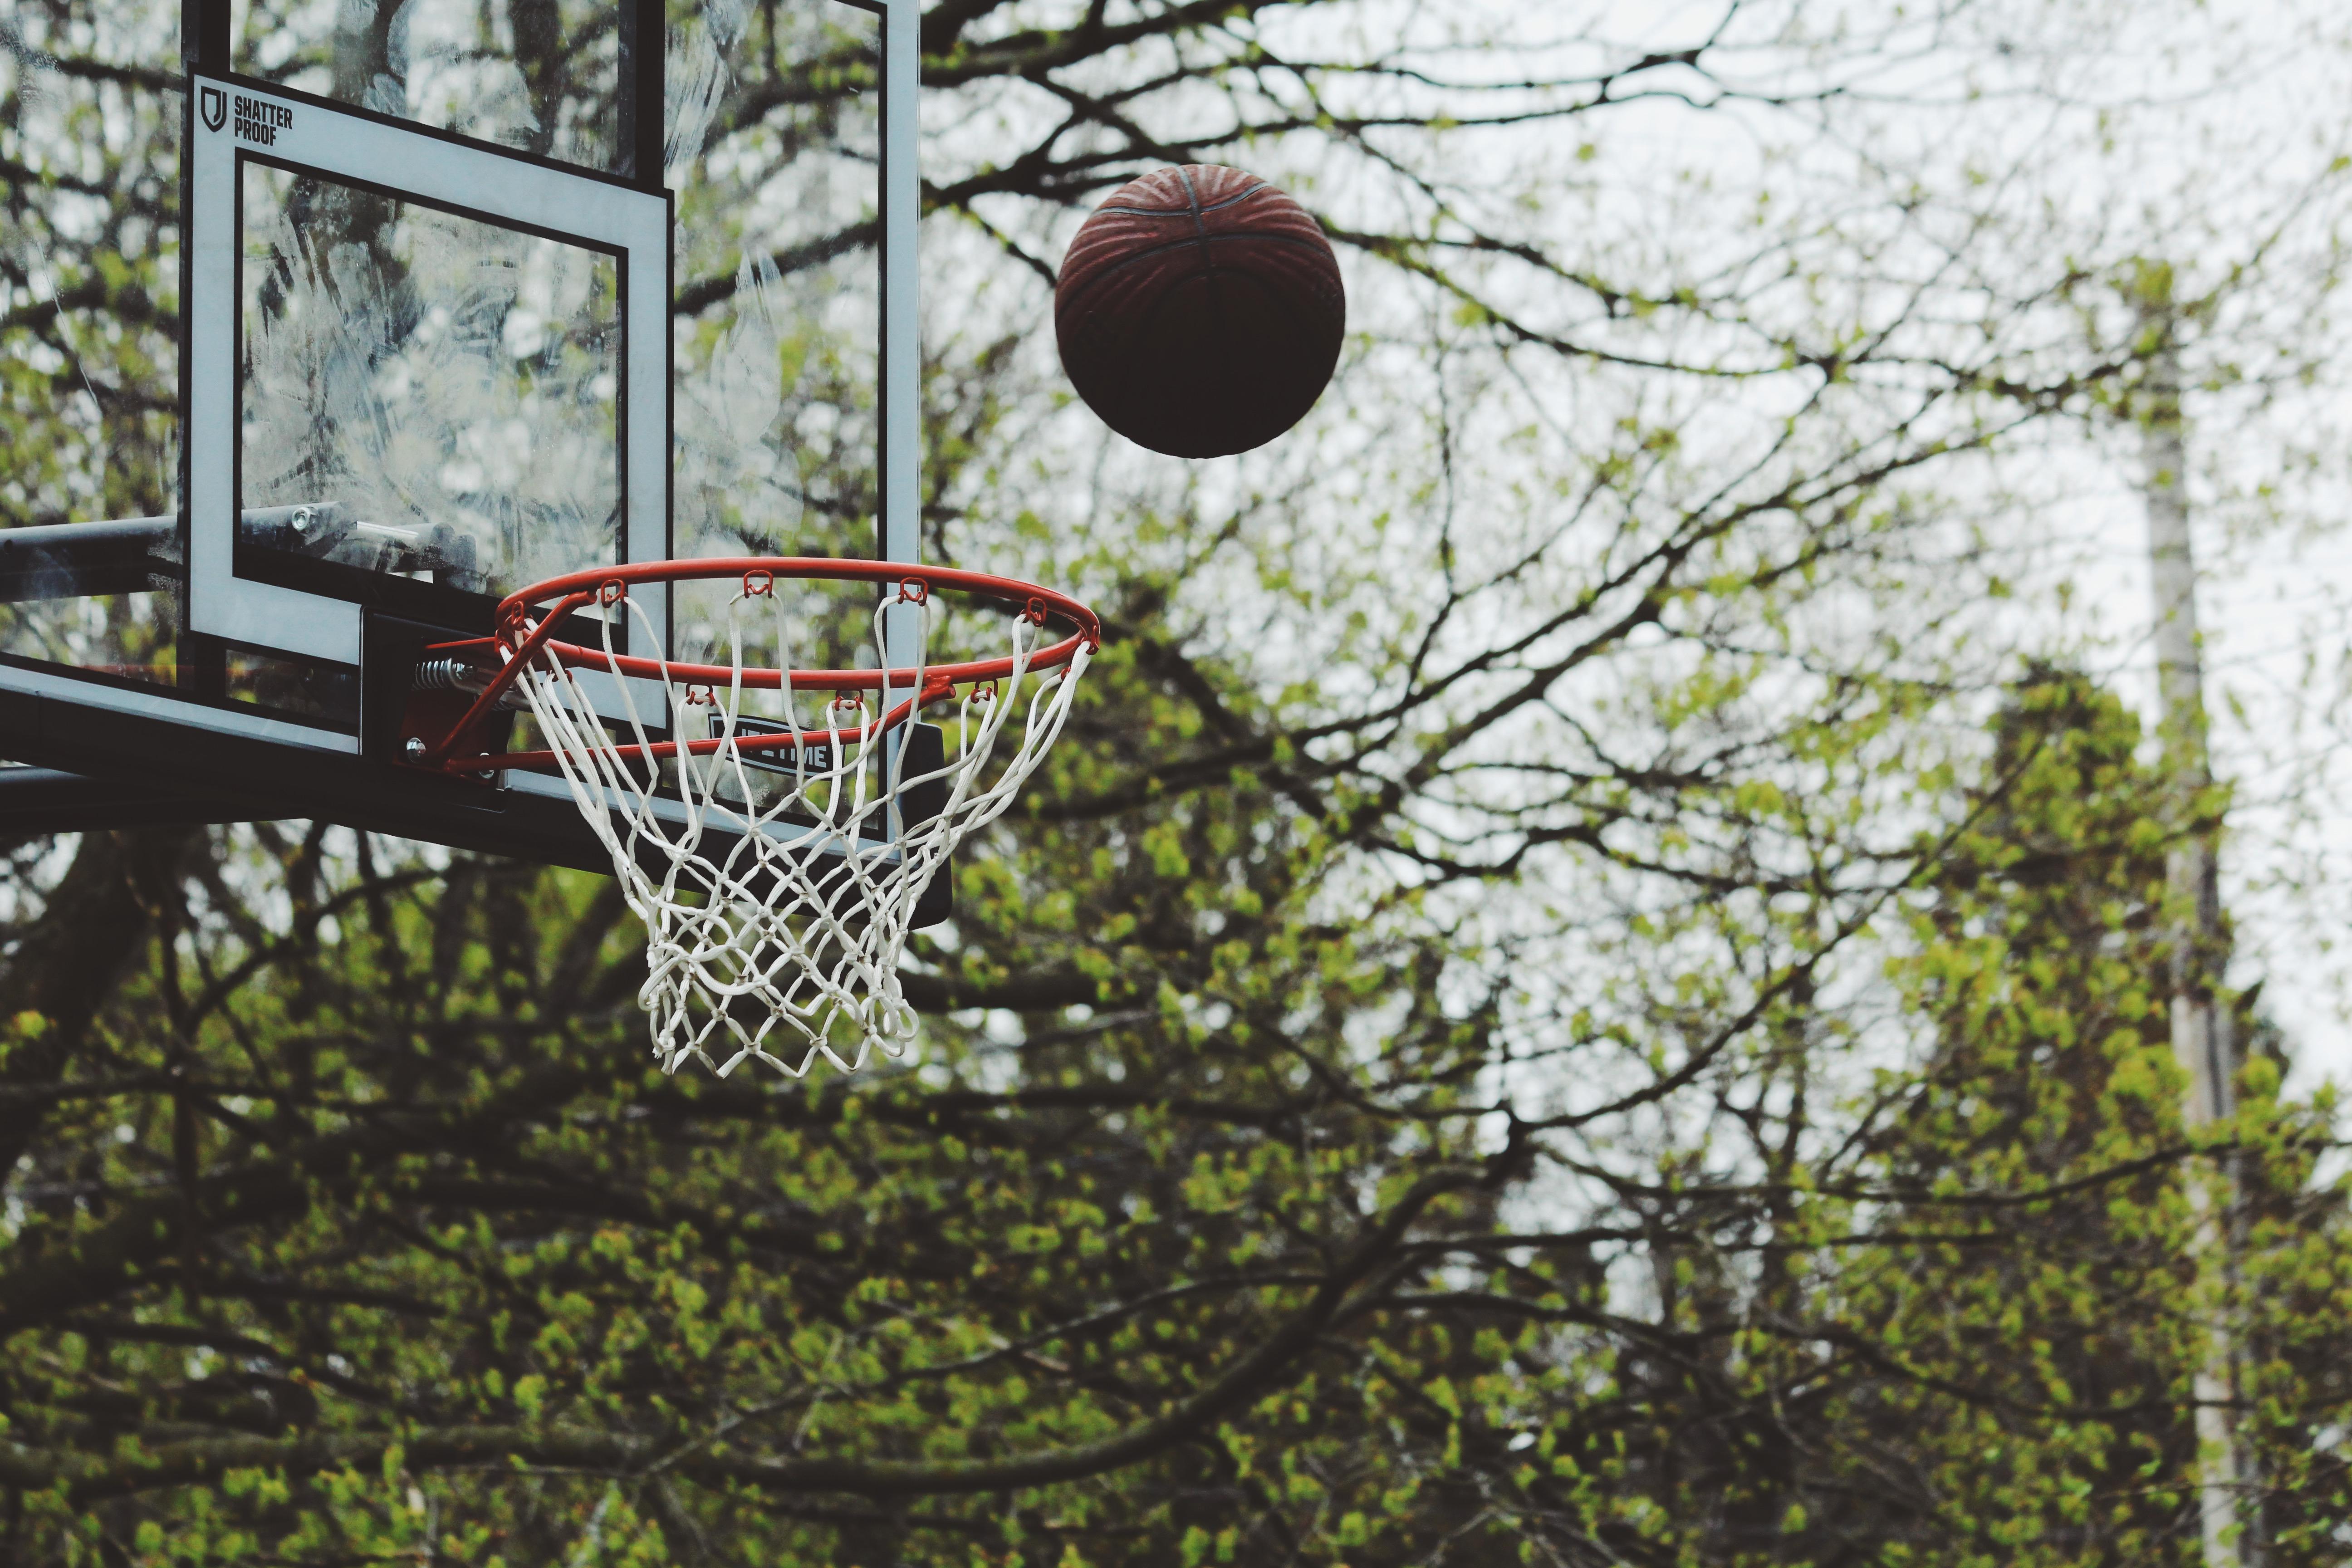 free images tree branch sport flower basketball lighting